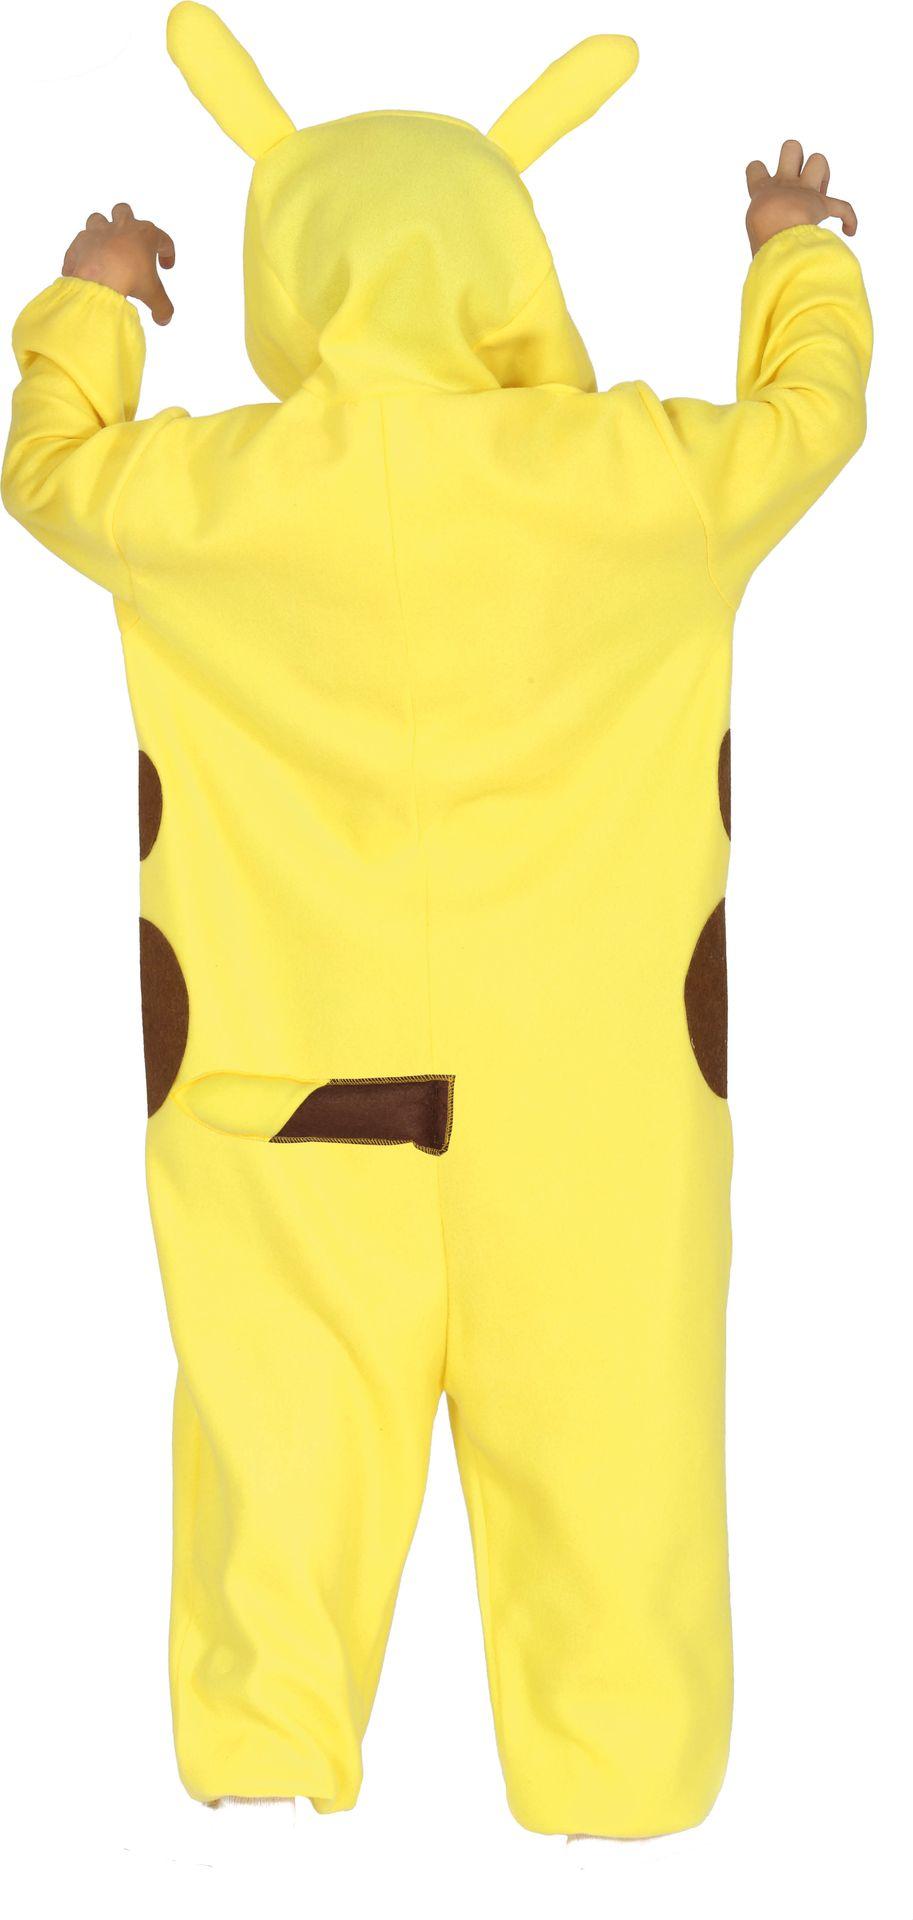 Pikachu kostuum kind (Look-a-like)